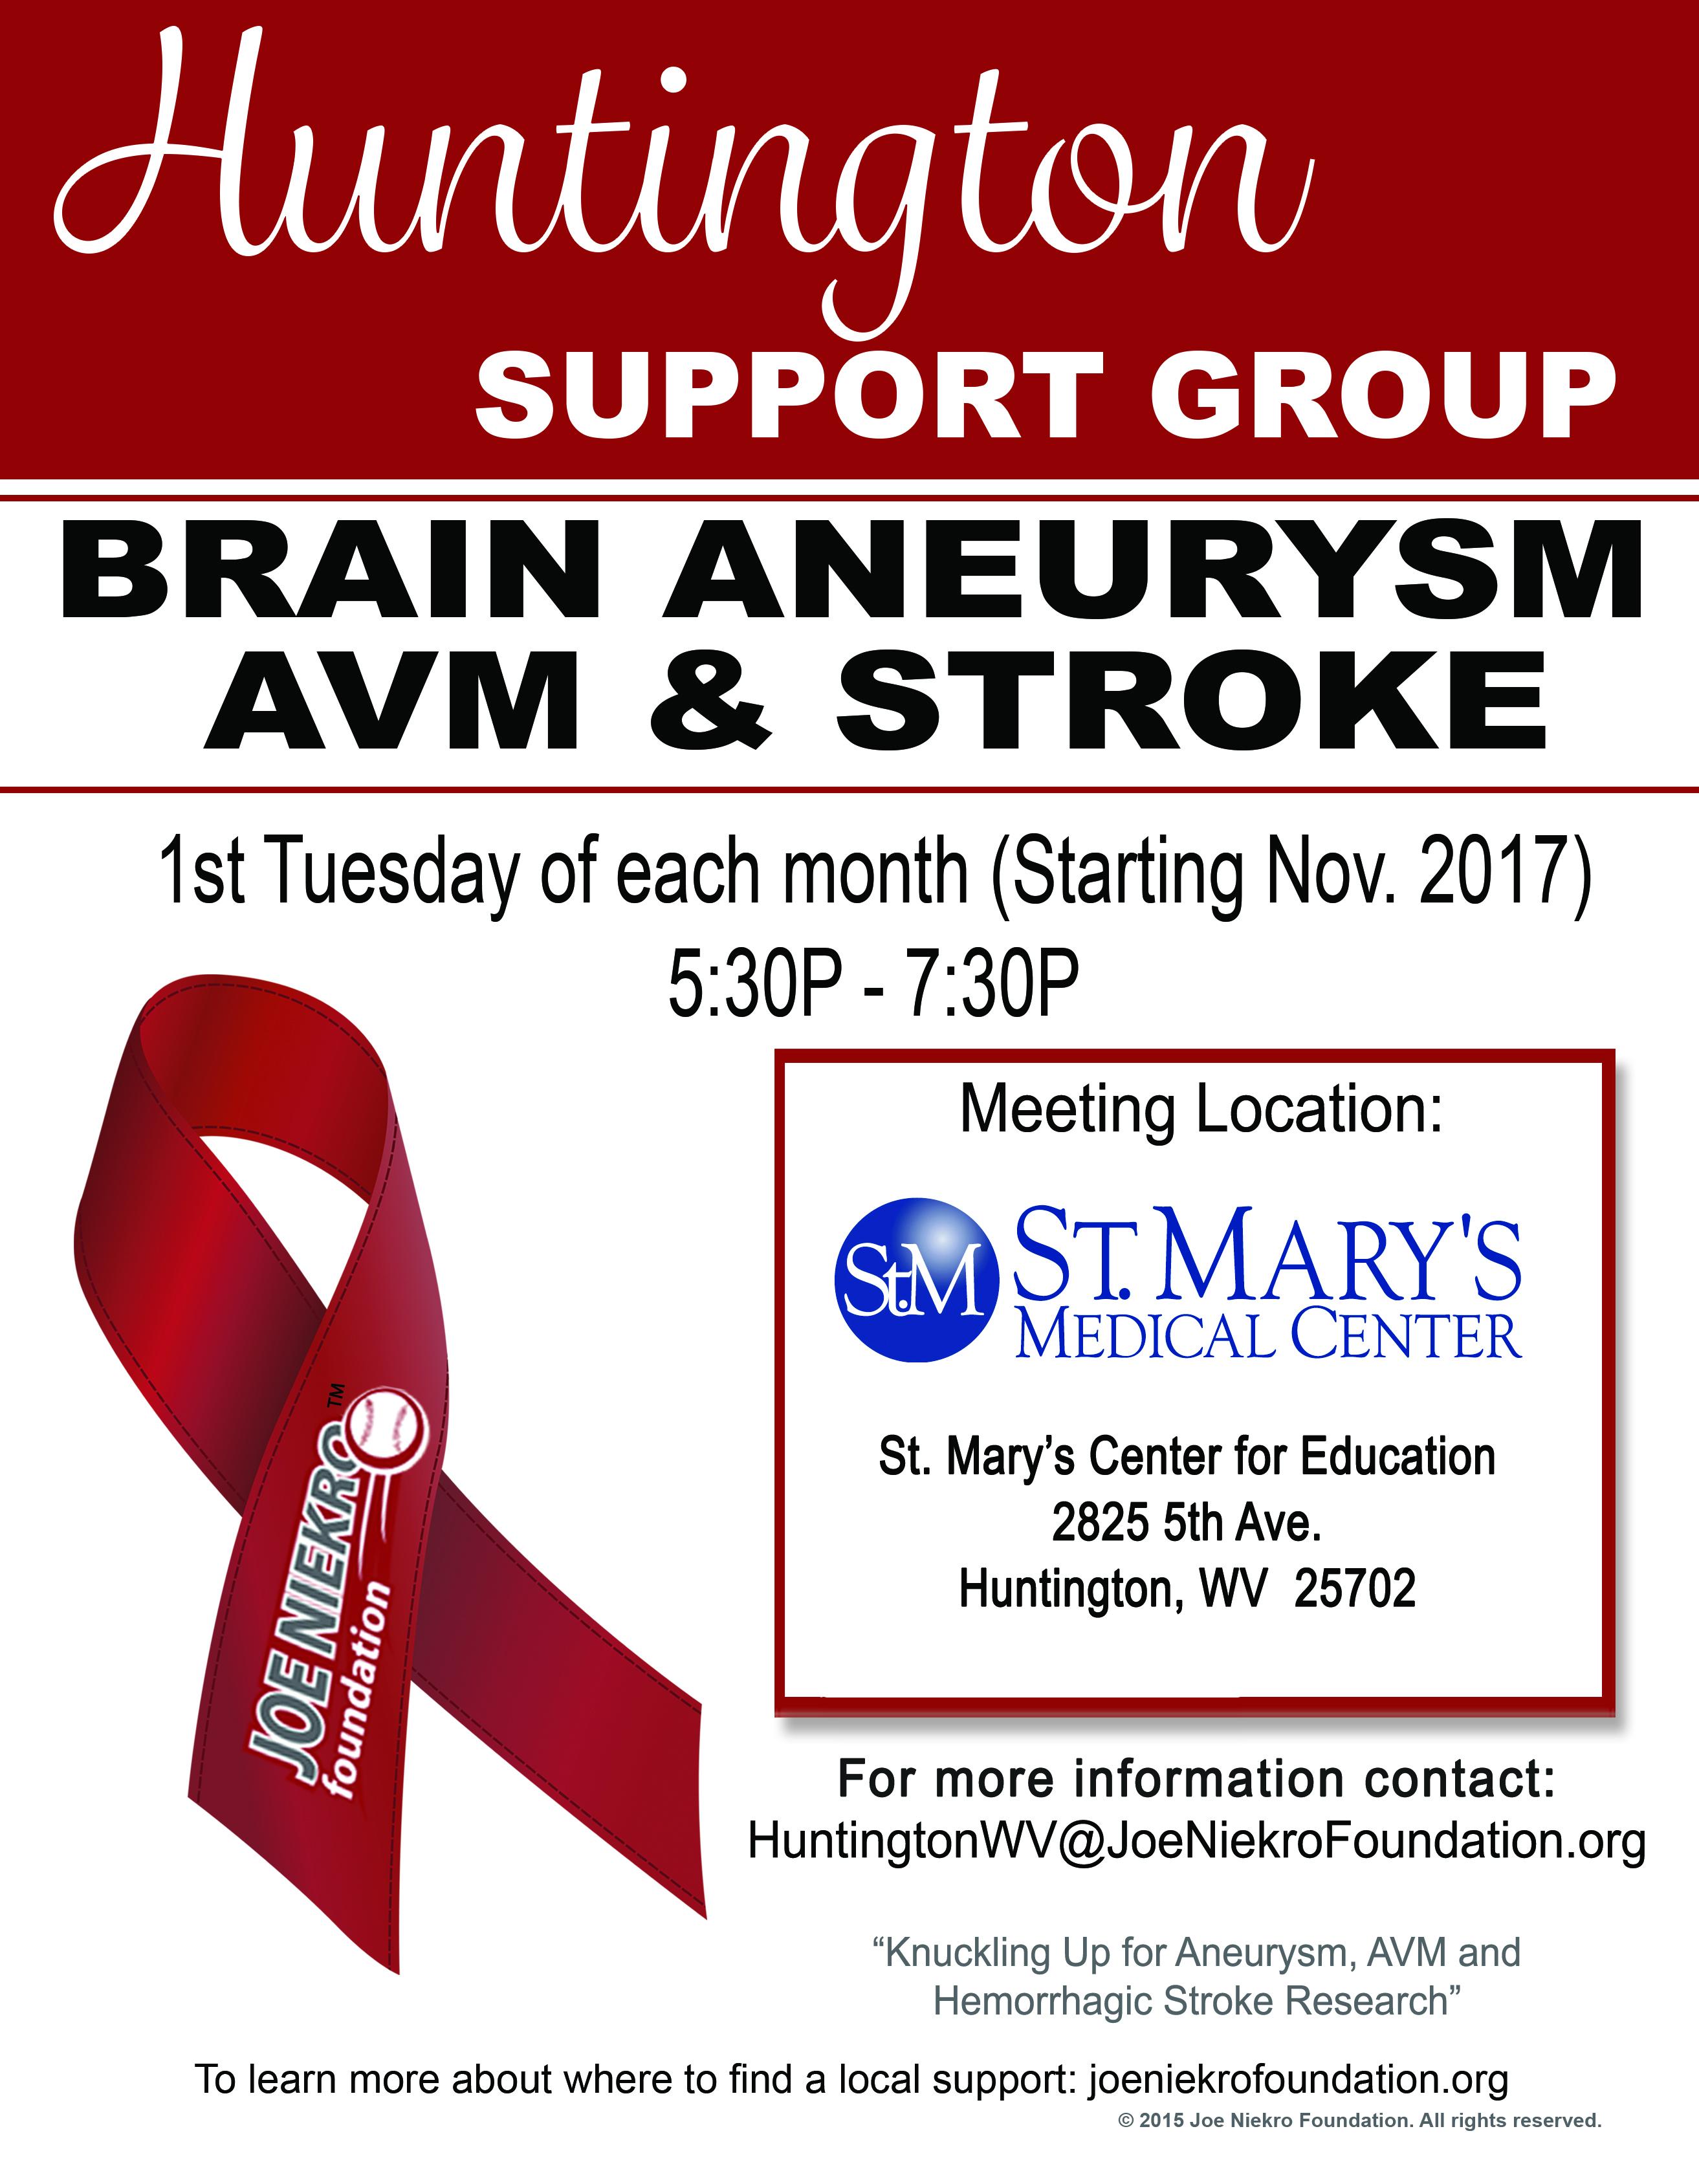 http://www.joeniekrofoundation.com/patient-caregiver-support/support-groups/locations/attachment/huntington-poster/